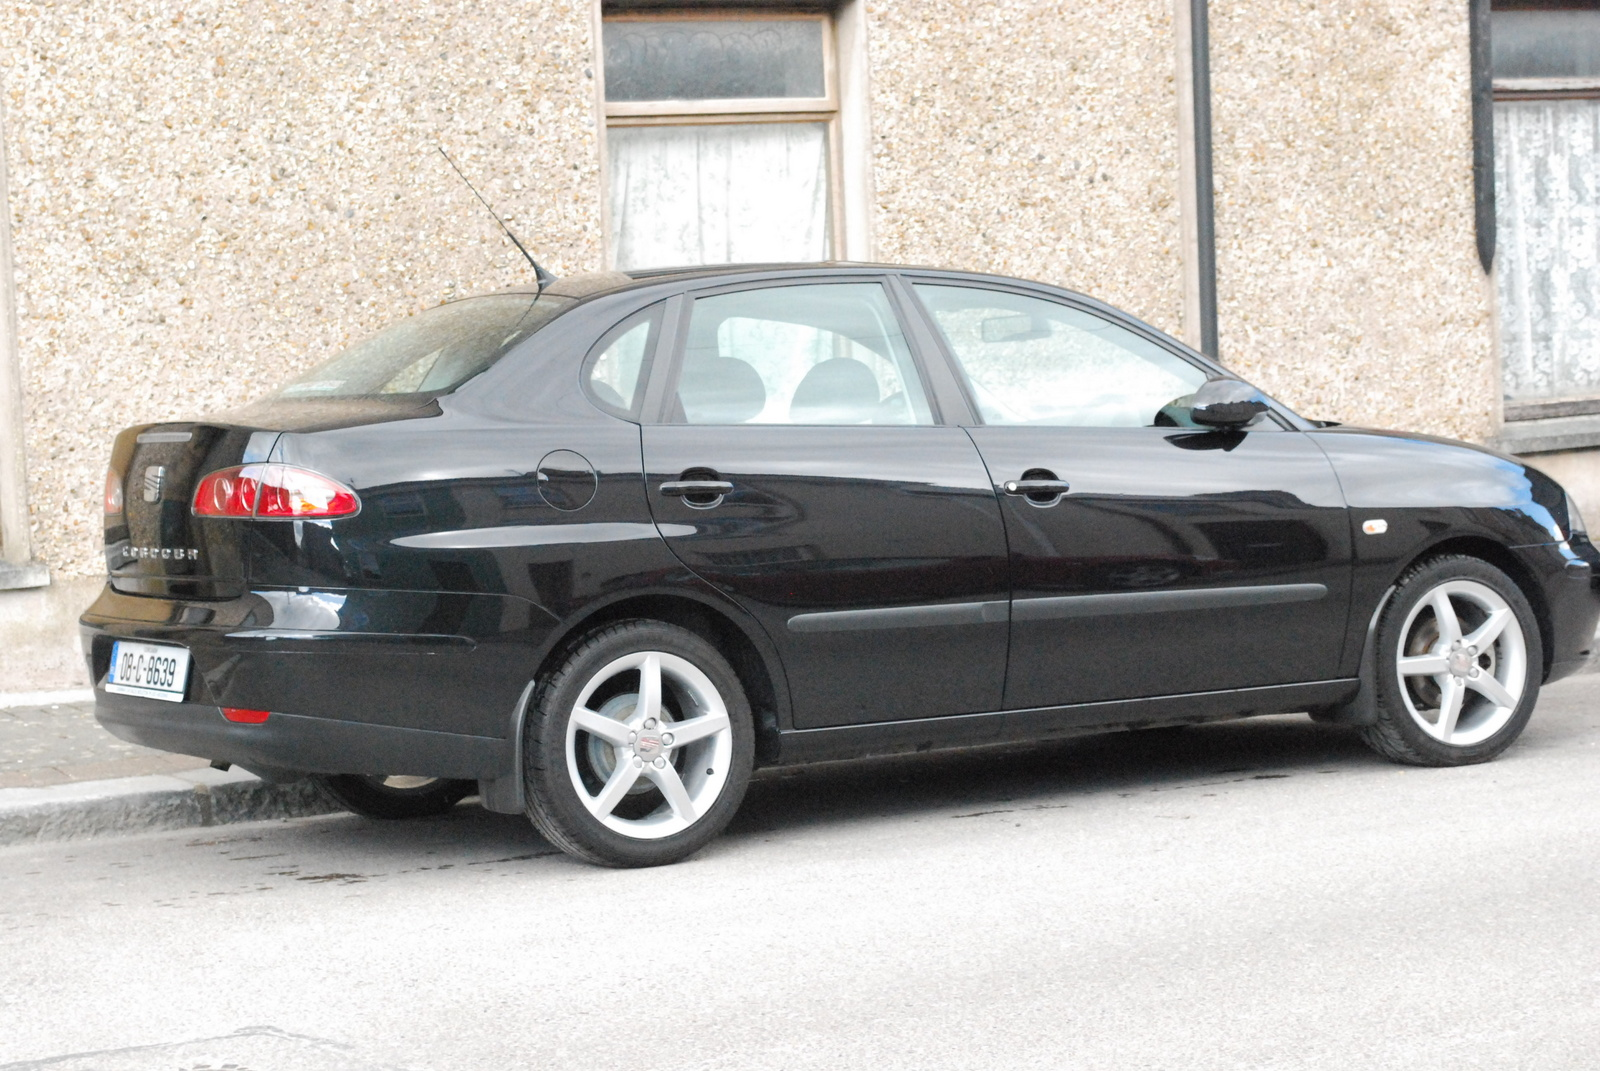 Picture of 2008 Seat Cordoba, exterior